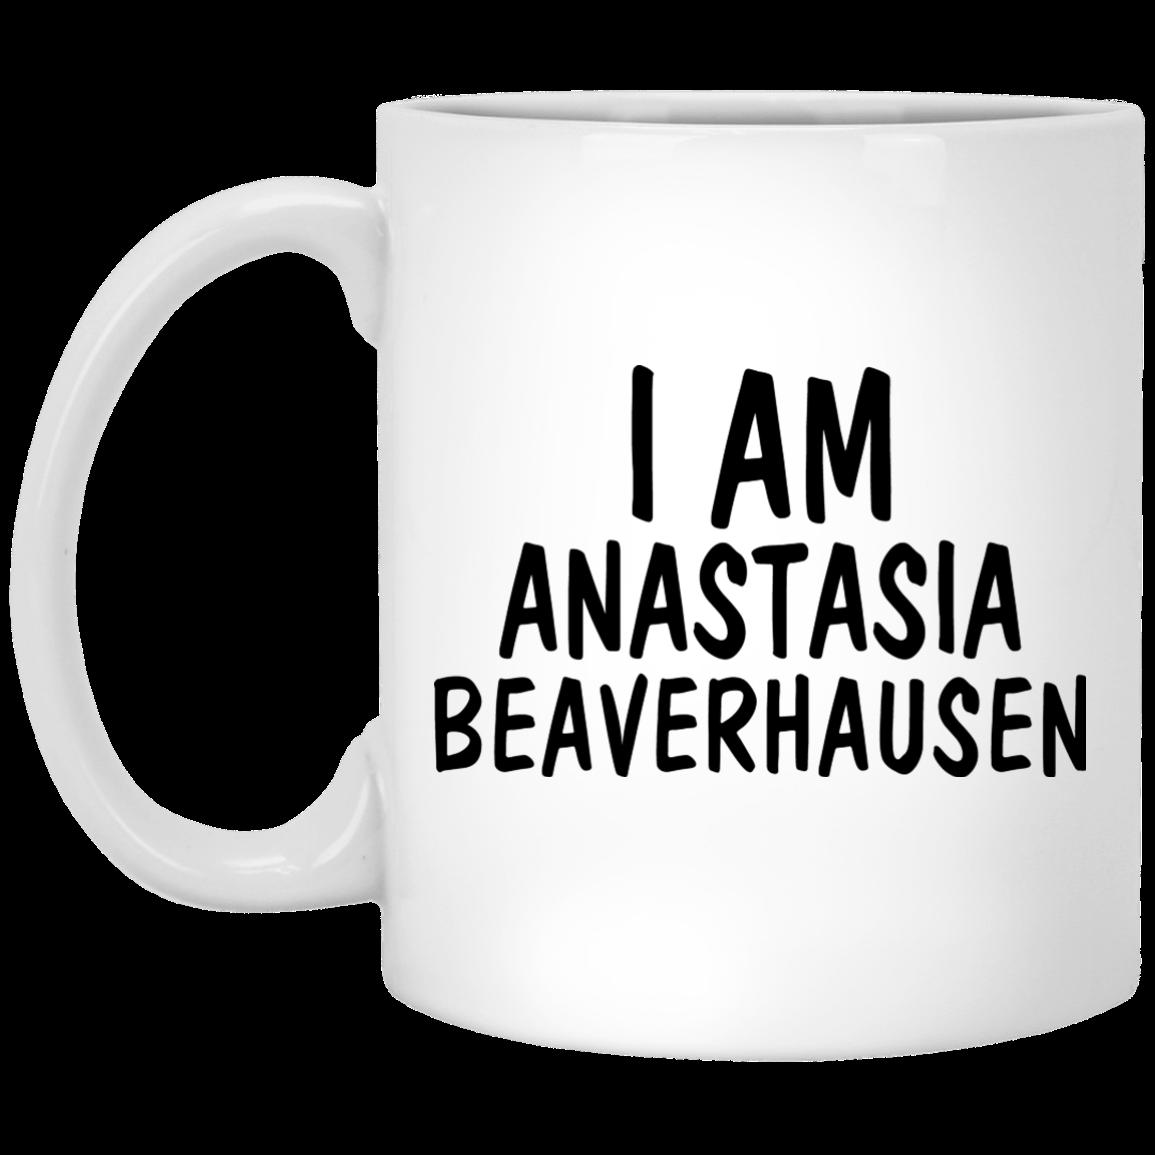 image - Will & Grace: I Am Anastasia Beaverhausen mug